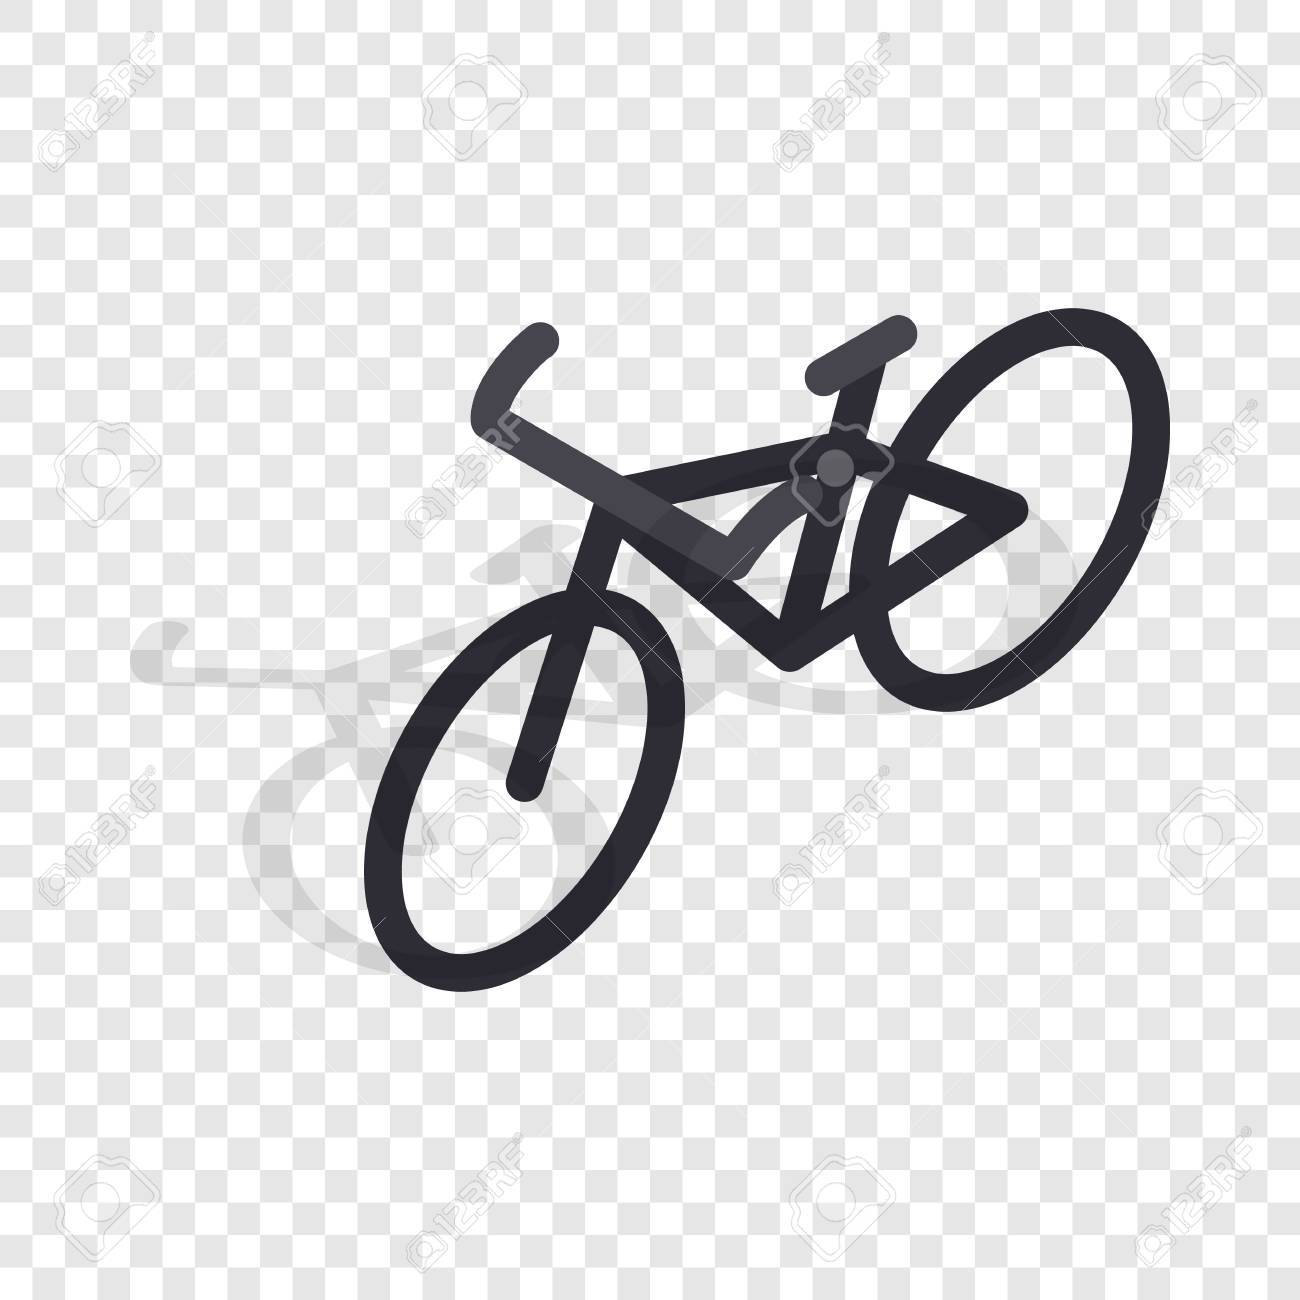 73224076-black-bike-isometric-icon-3d-on-a-transparent-background-vector-illustration.jpg